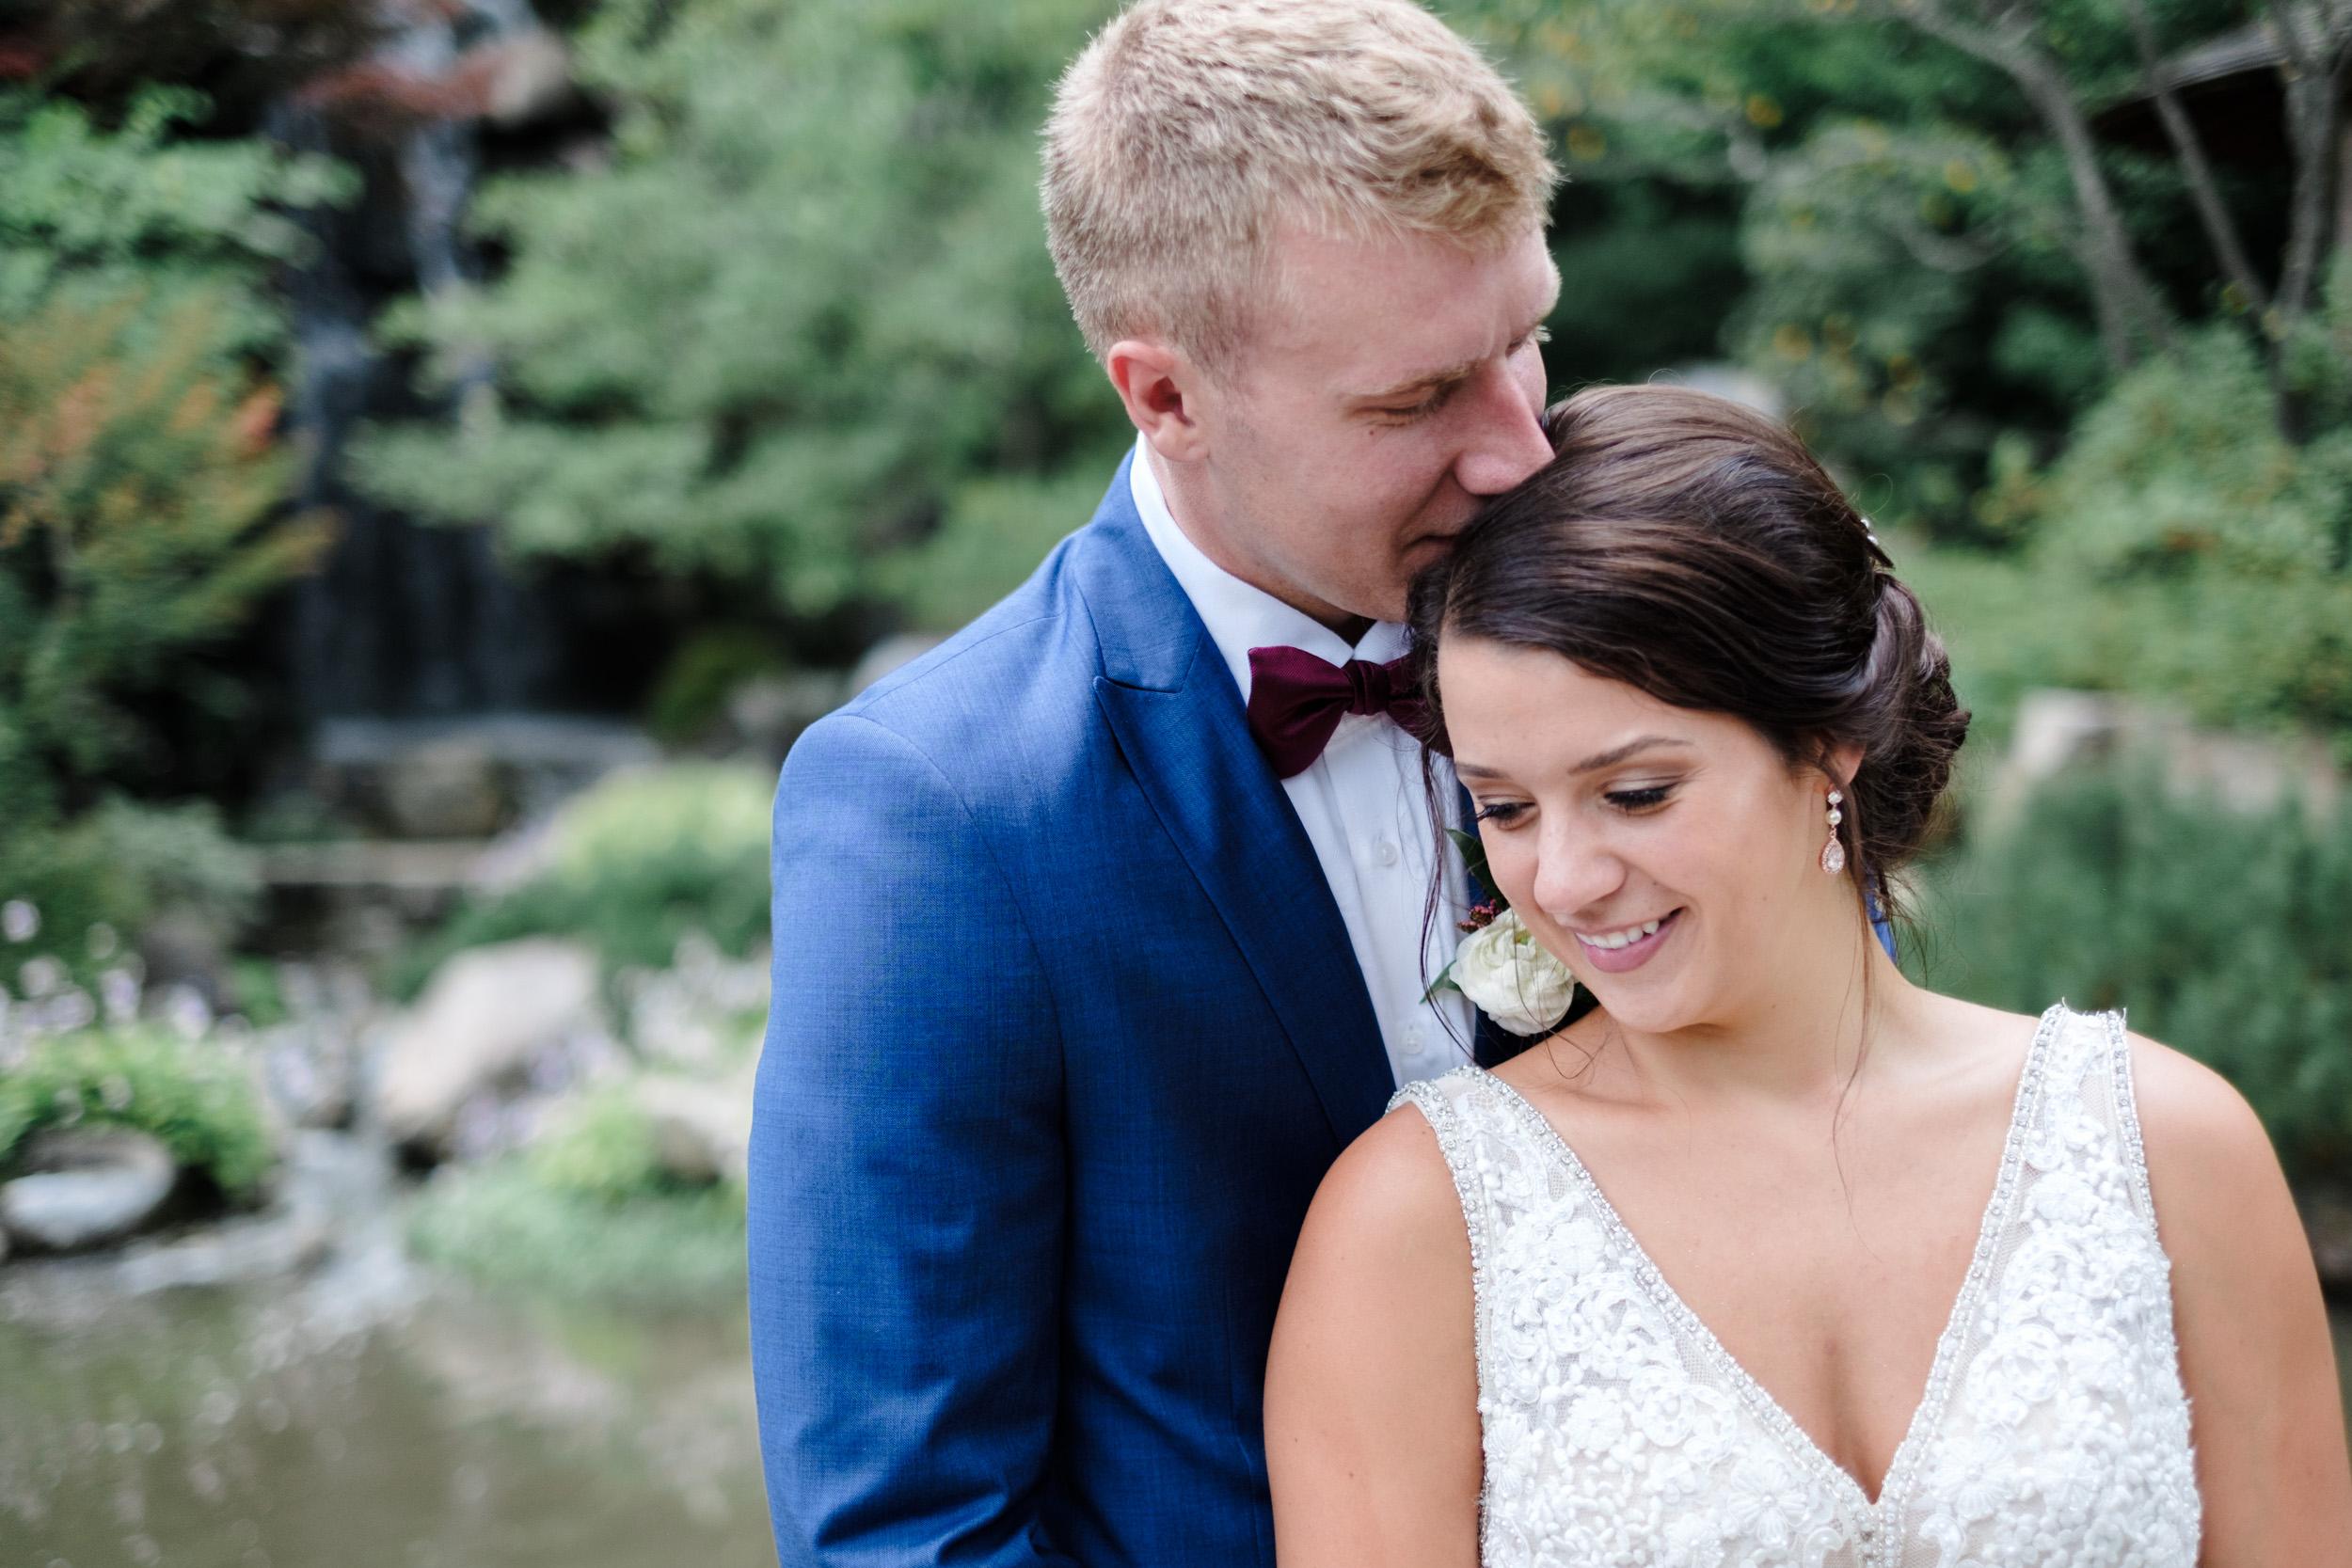 18-09-01 BAP Kiley-Trevor-Anderson-Gardens-Wedding-71.jpg